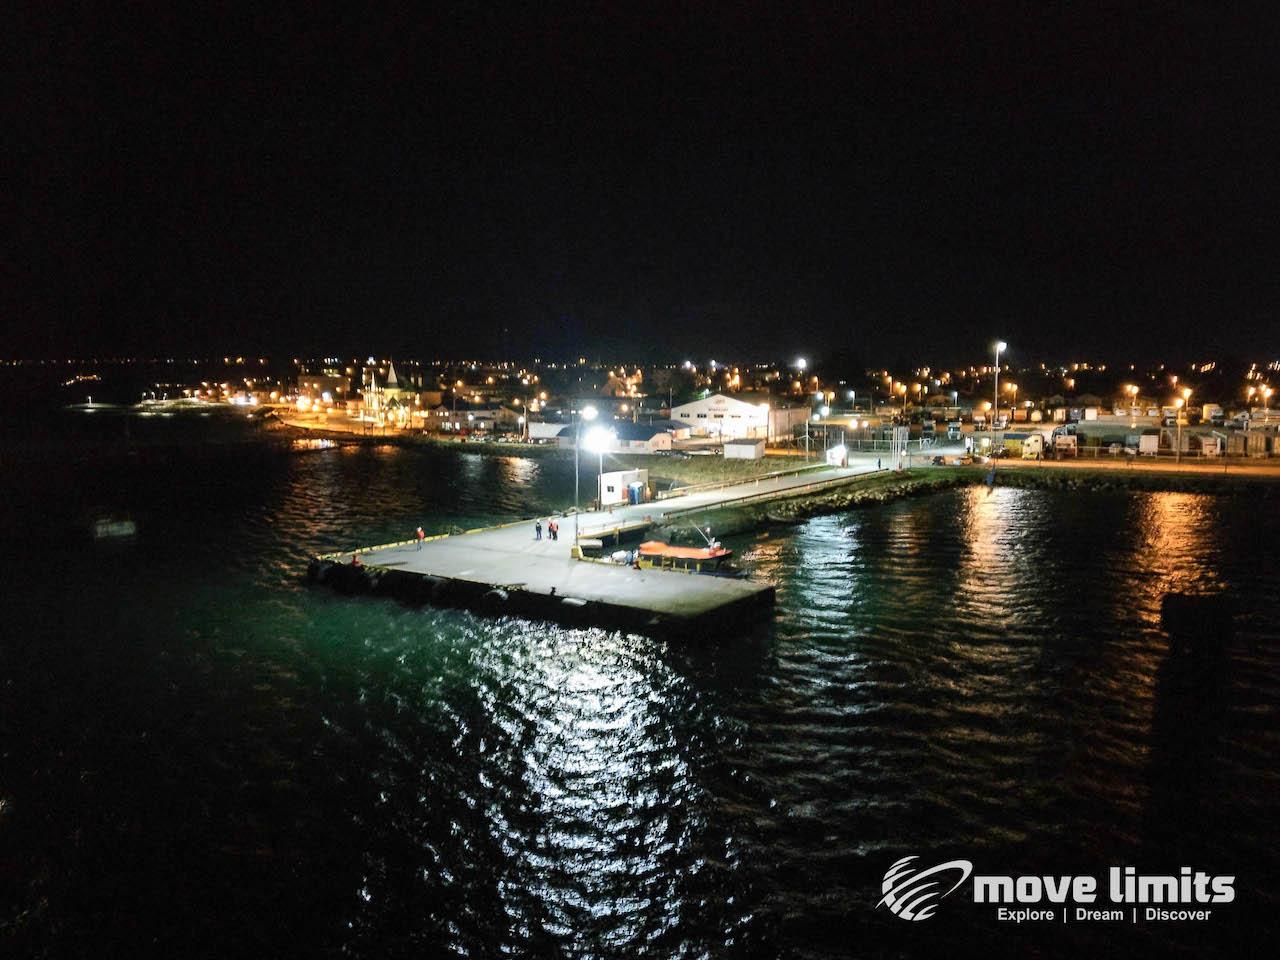 Hafen von Puerto Natales_Kreuzfahrt in Patagonien_movelimits.de